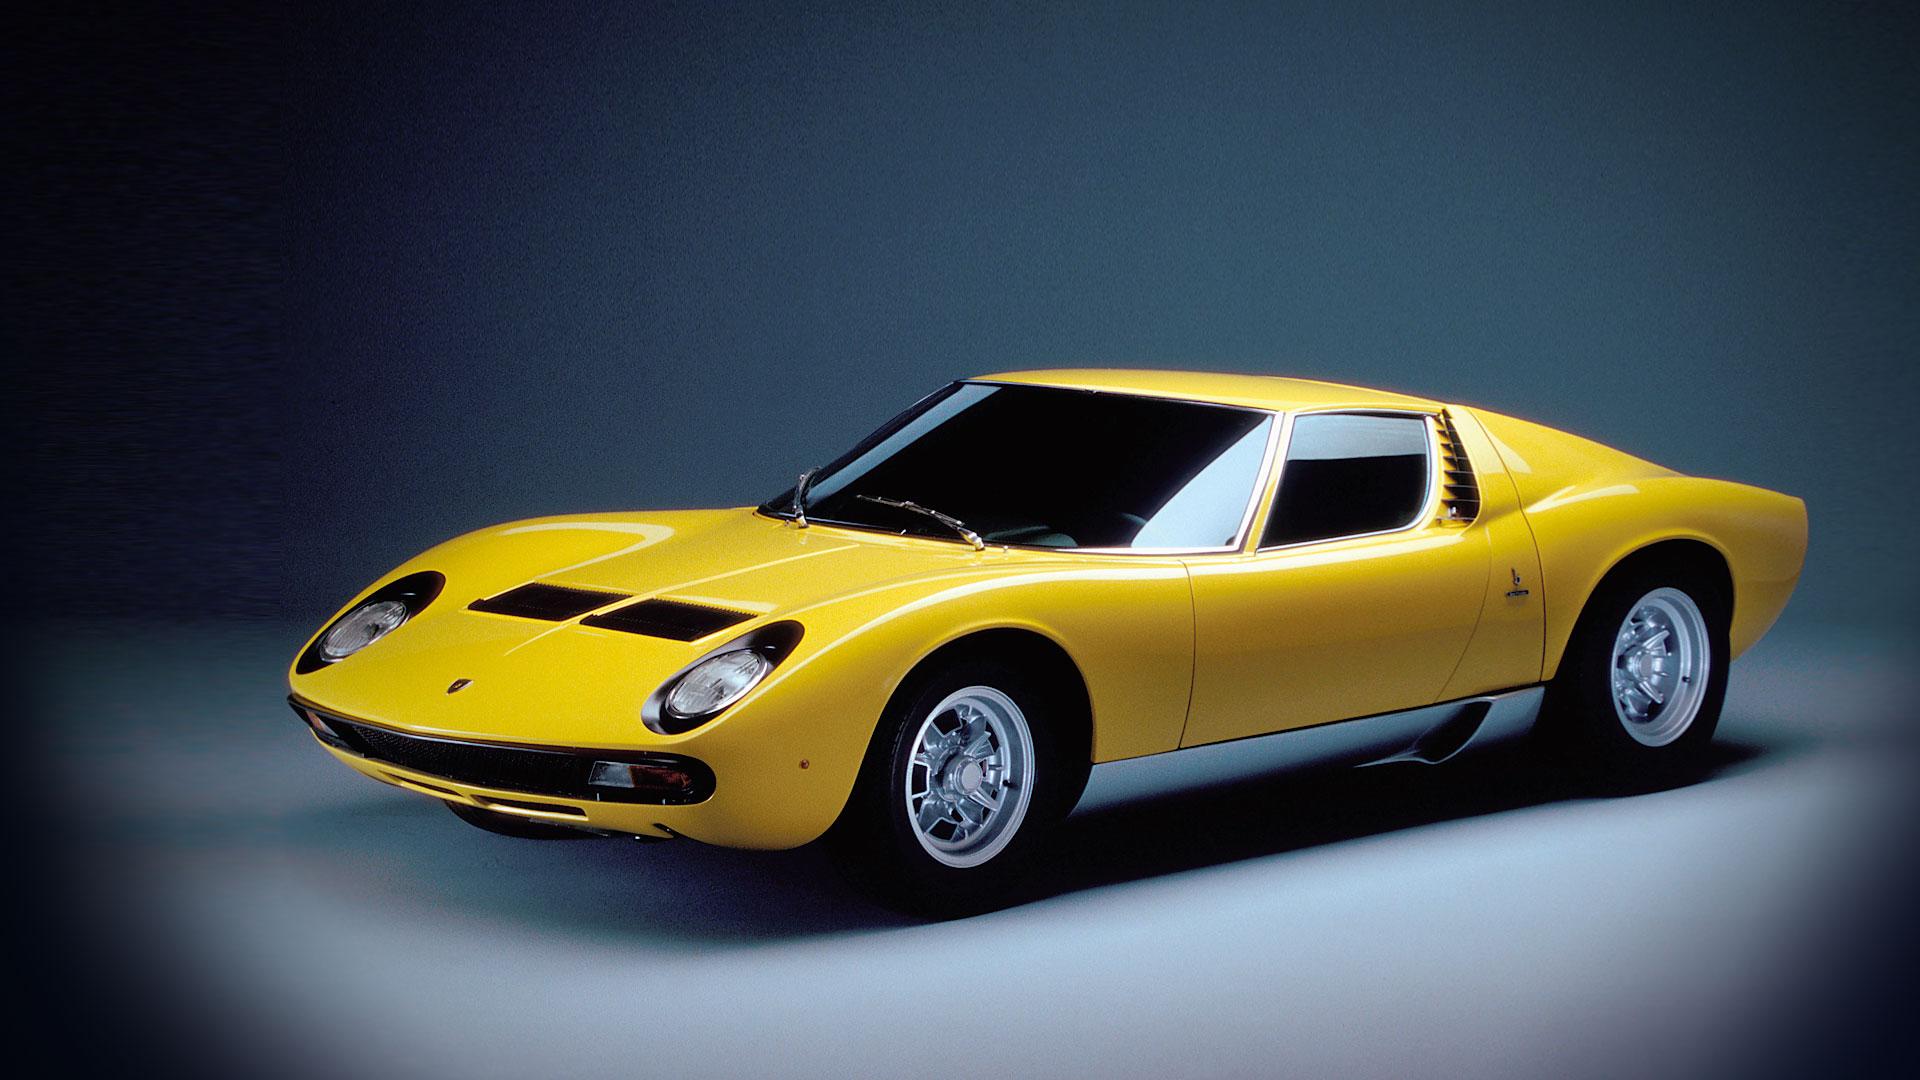 Lamborghini Miura - profil avant / front side-face